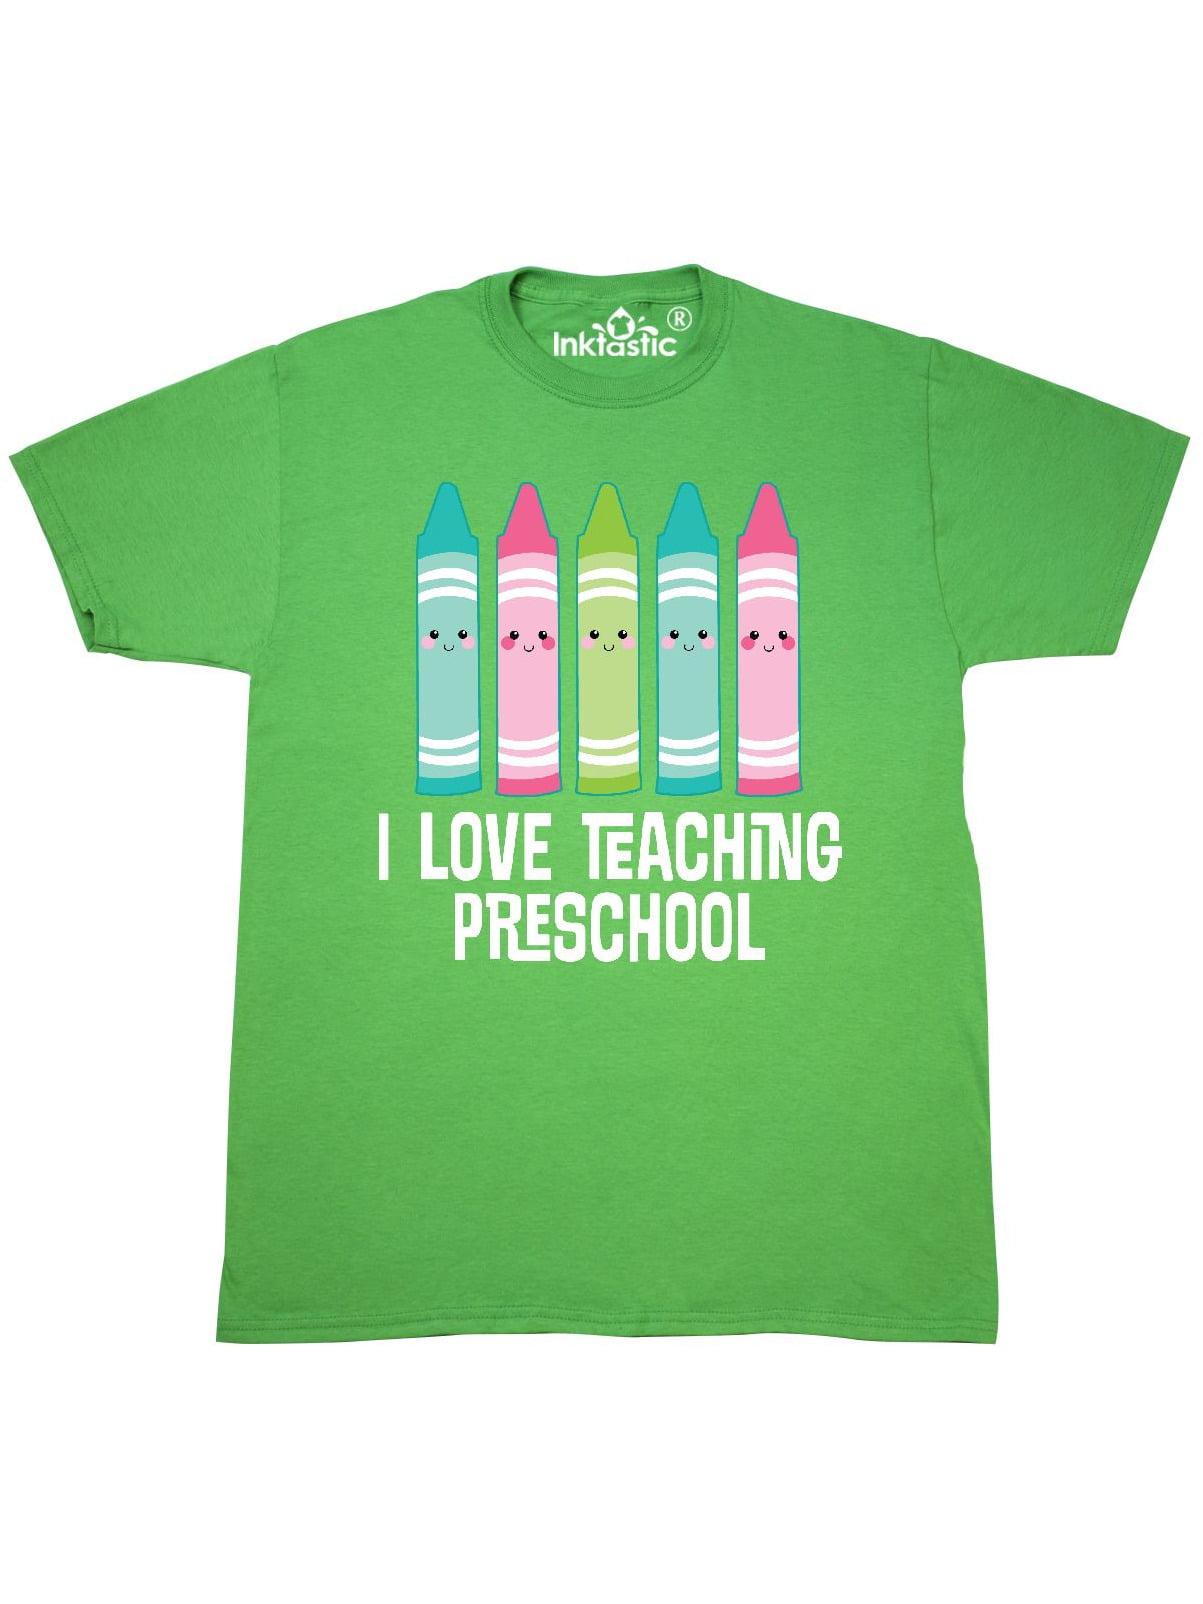 9b1b7730 Inktastic - I love Teaching Preschool Teacher Gift T-Shirt - Walmart.com